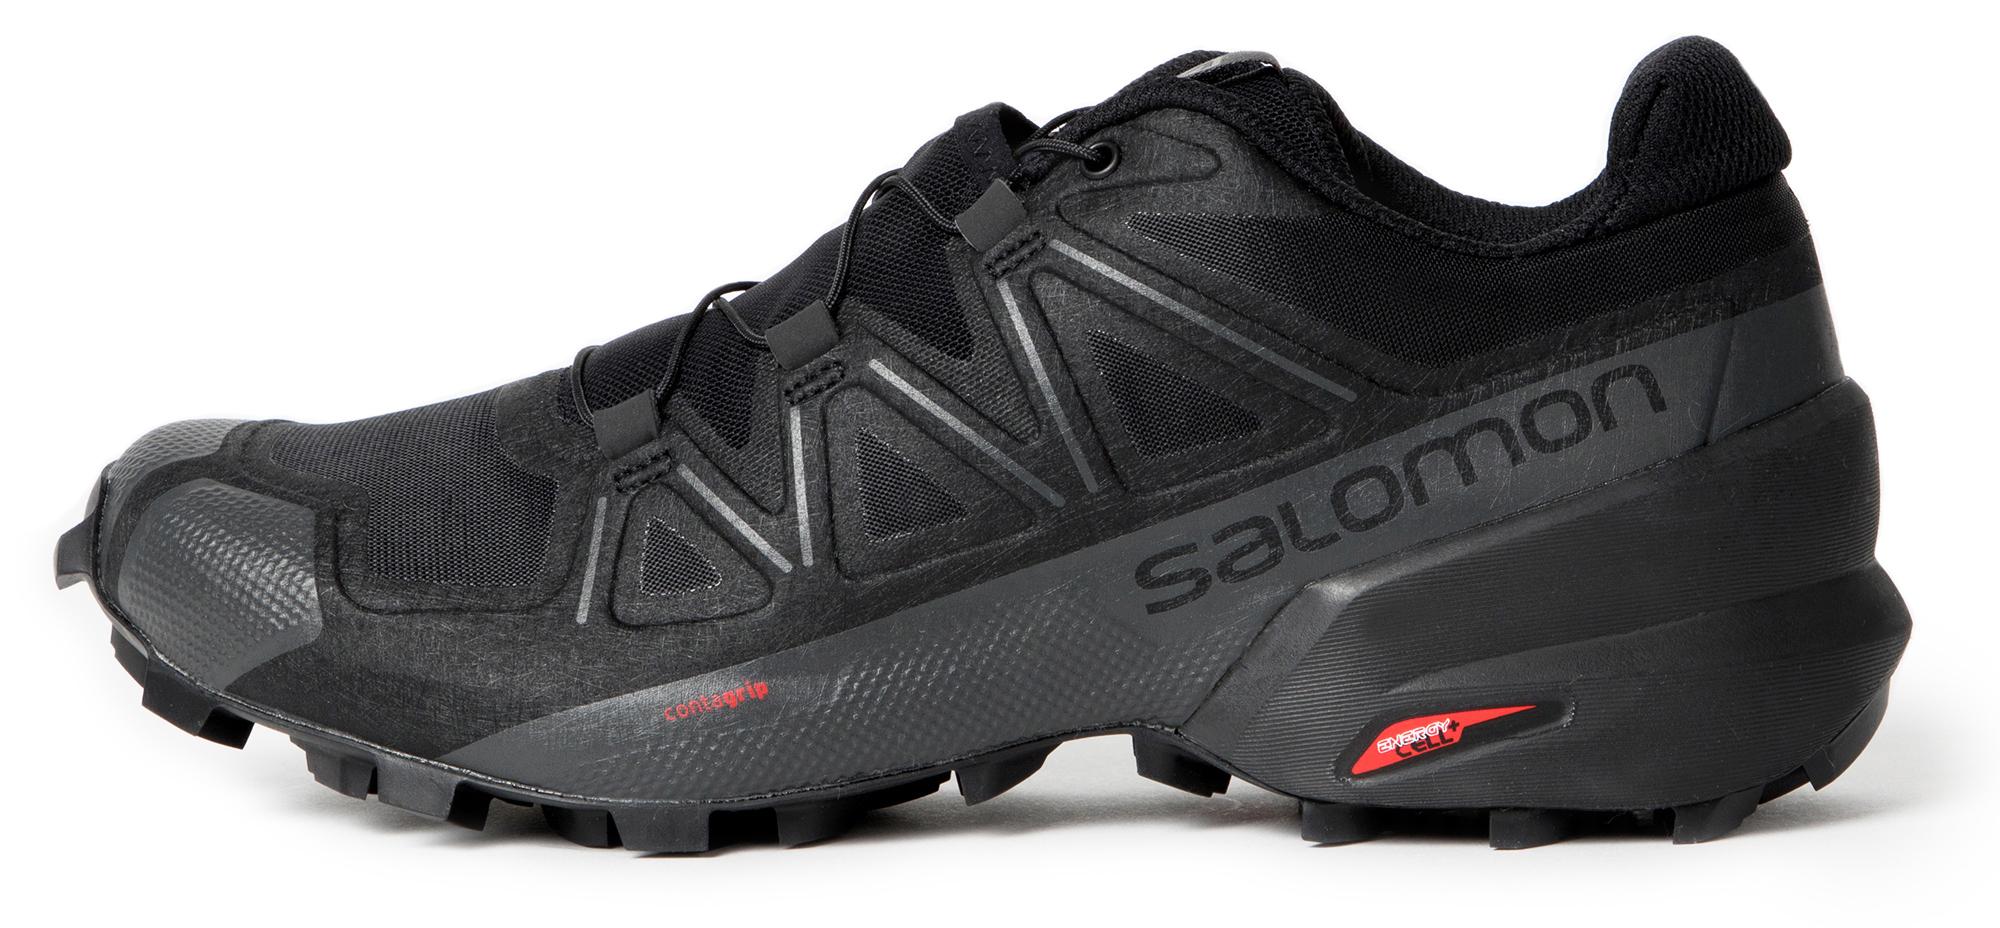 цена на Salomon Кроссовки женские Salomon Speedcross 5, размер 40